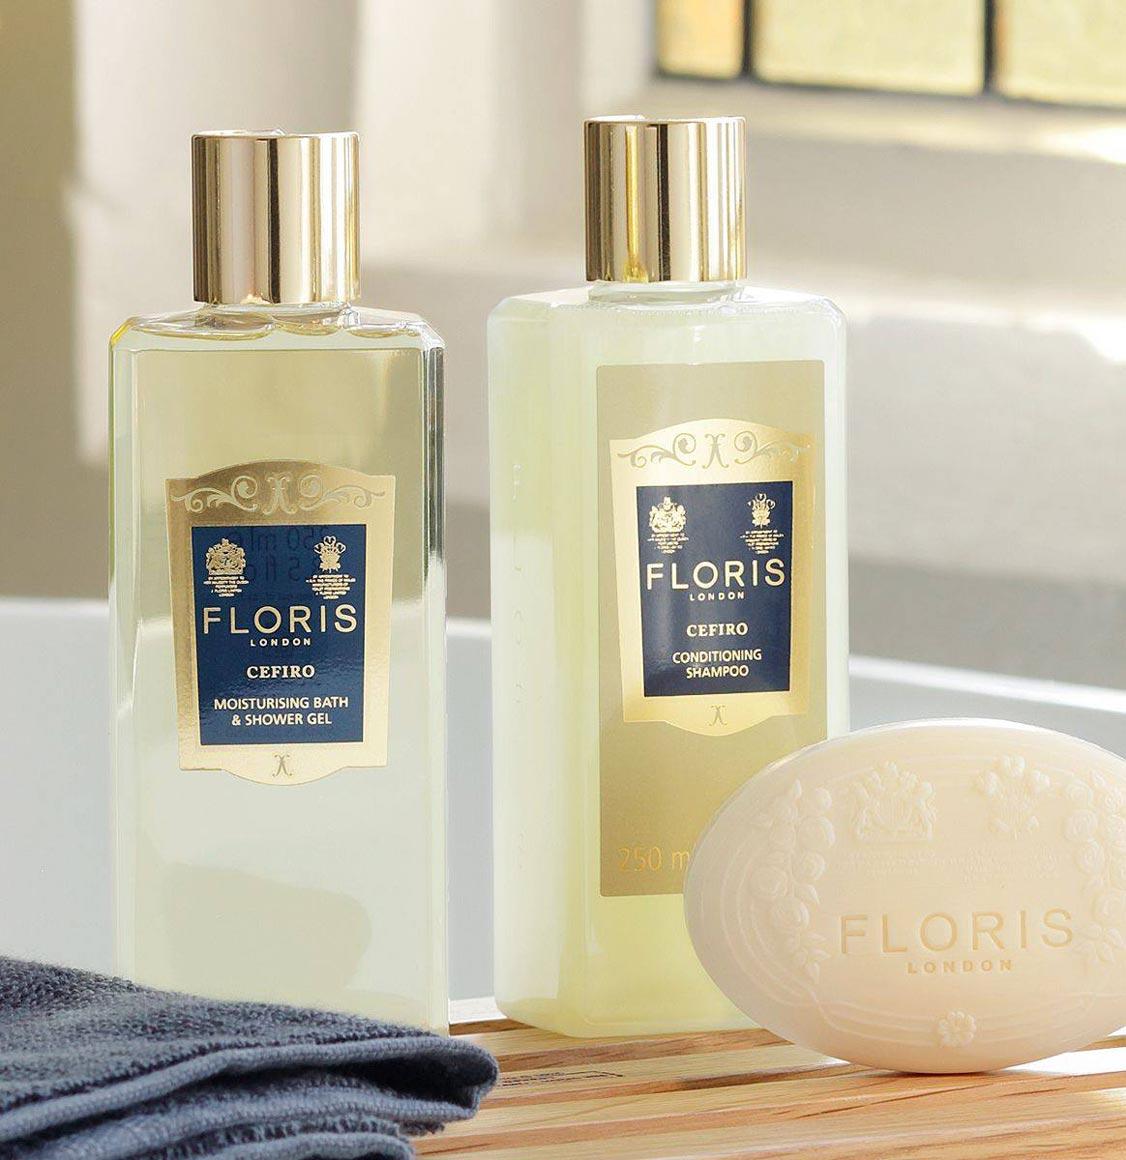 Floris London Cefiro Conditioning Shampoo 250ml